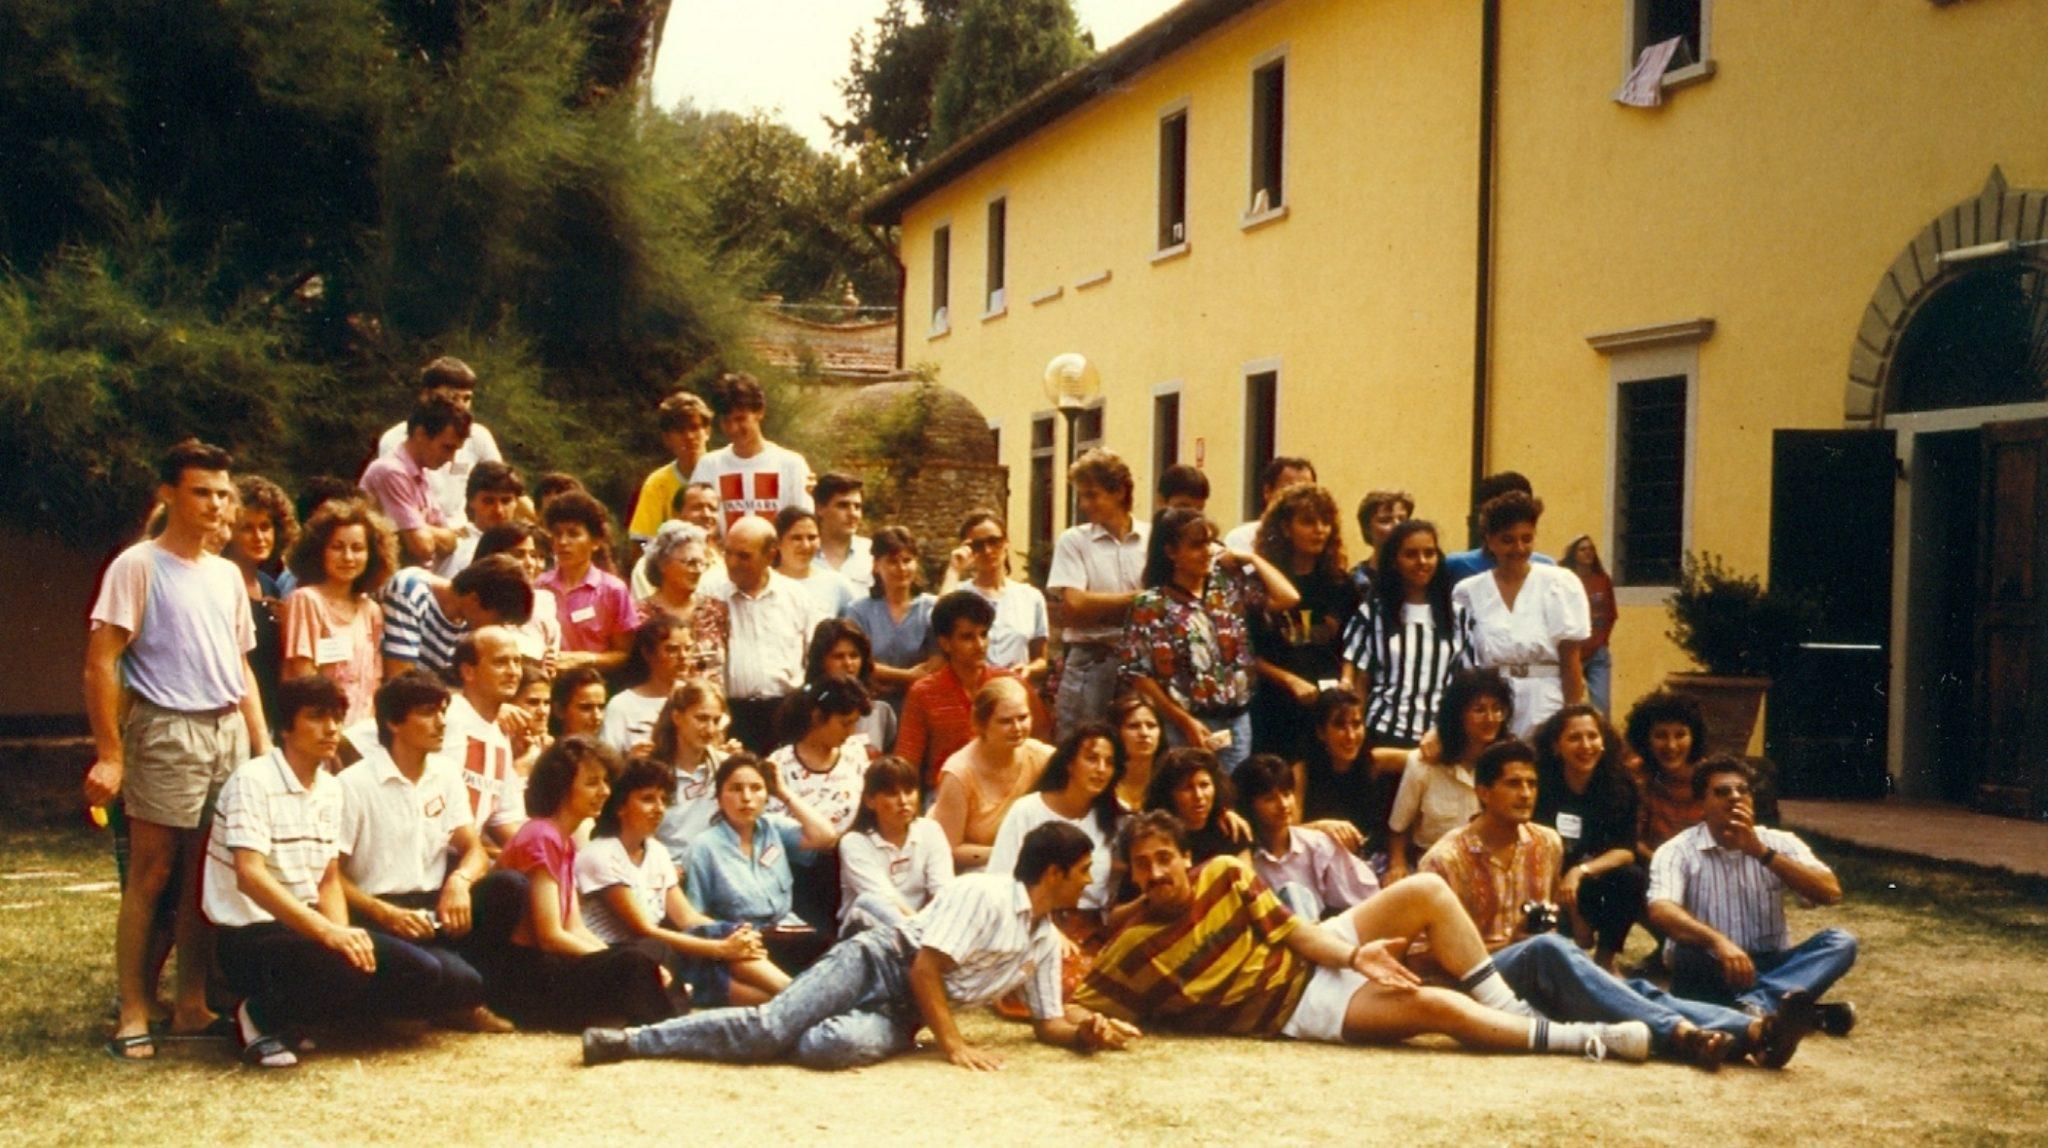 TINERI CRESTINI DUPA EVANGHELIE ROMANI IMPREUNA CU TINERI CREDINCIOSI ITALIENI LA POGGIO UBERTINI IN ITALIA 1990